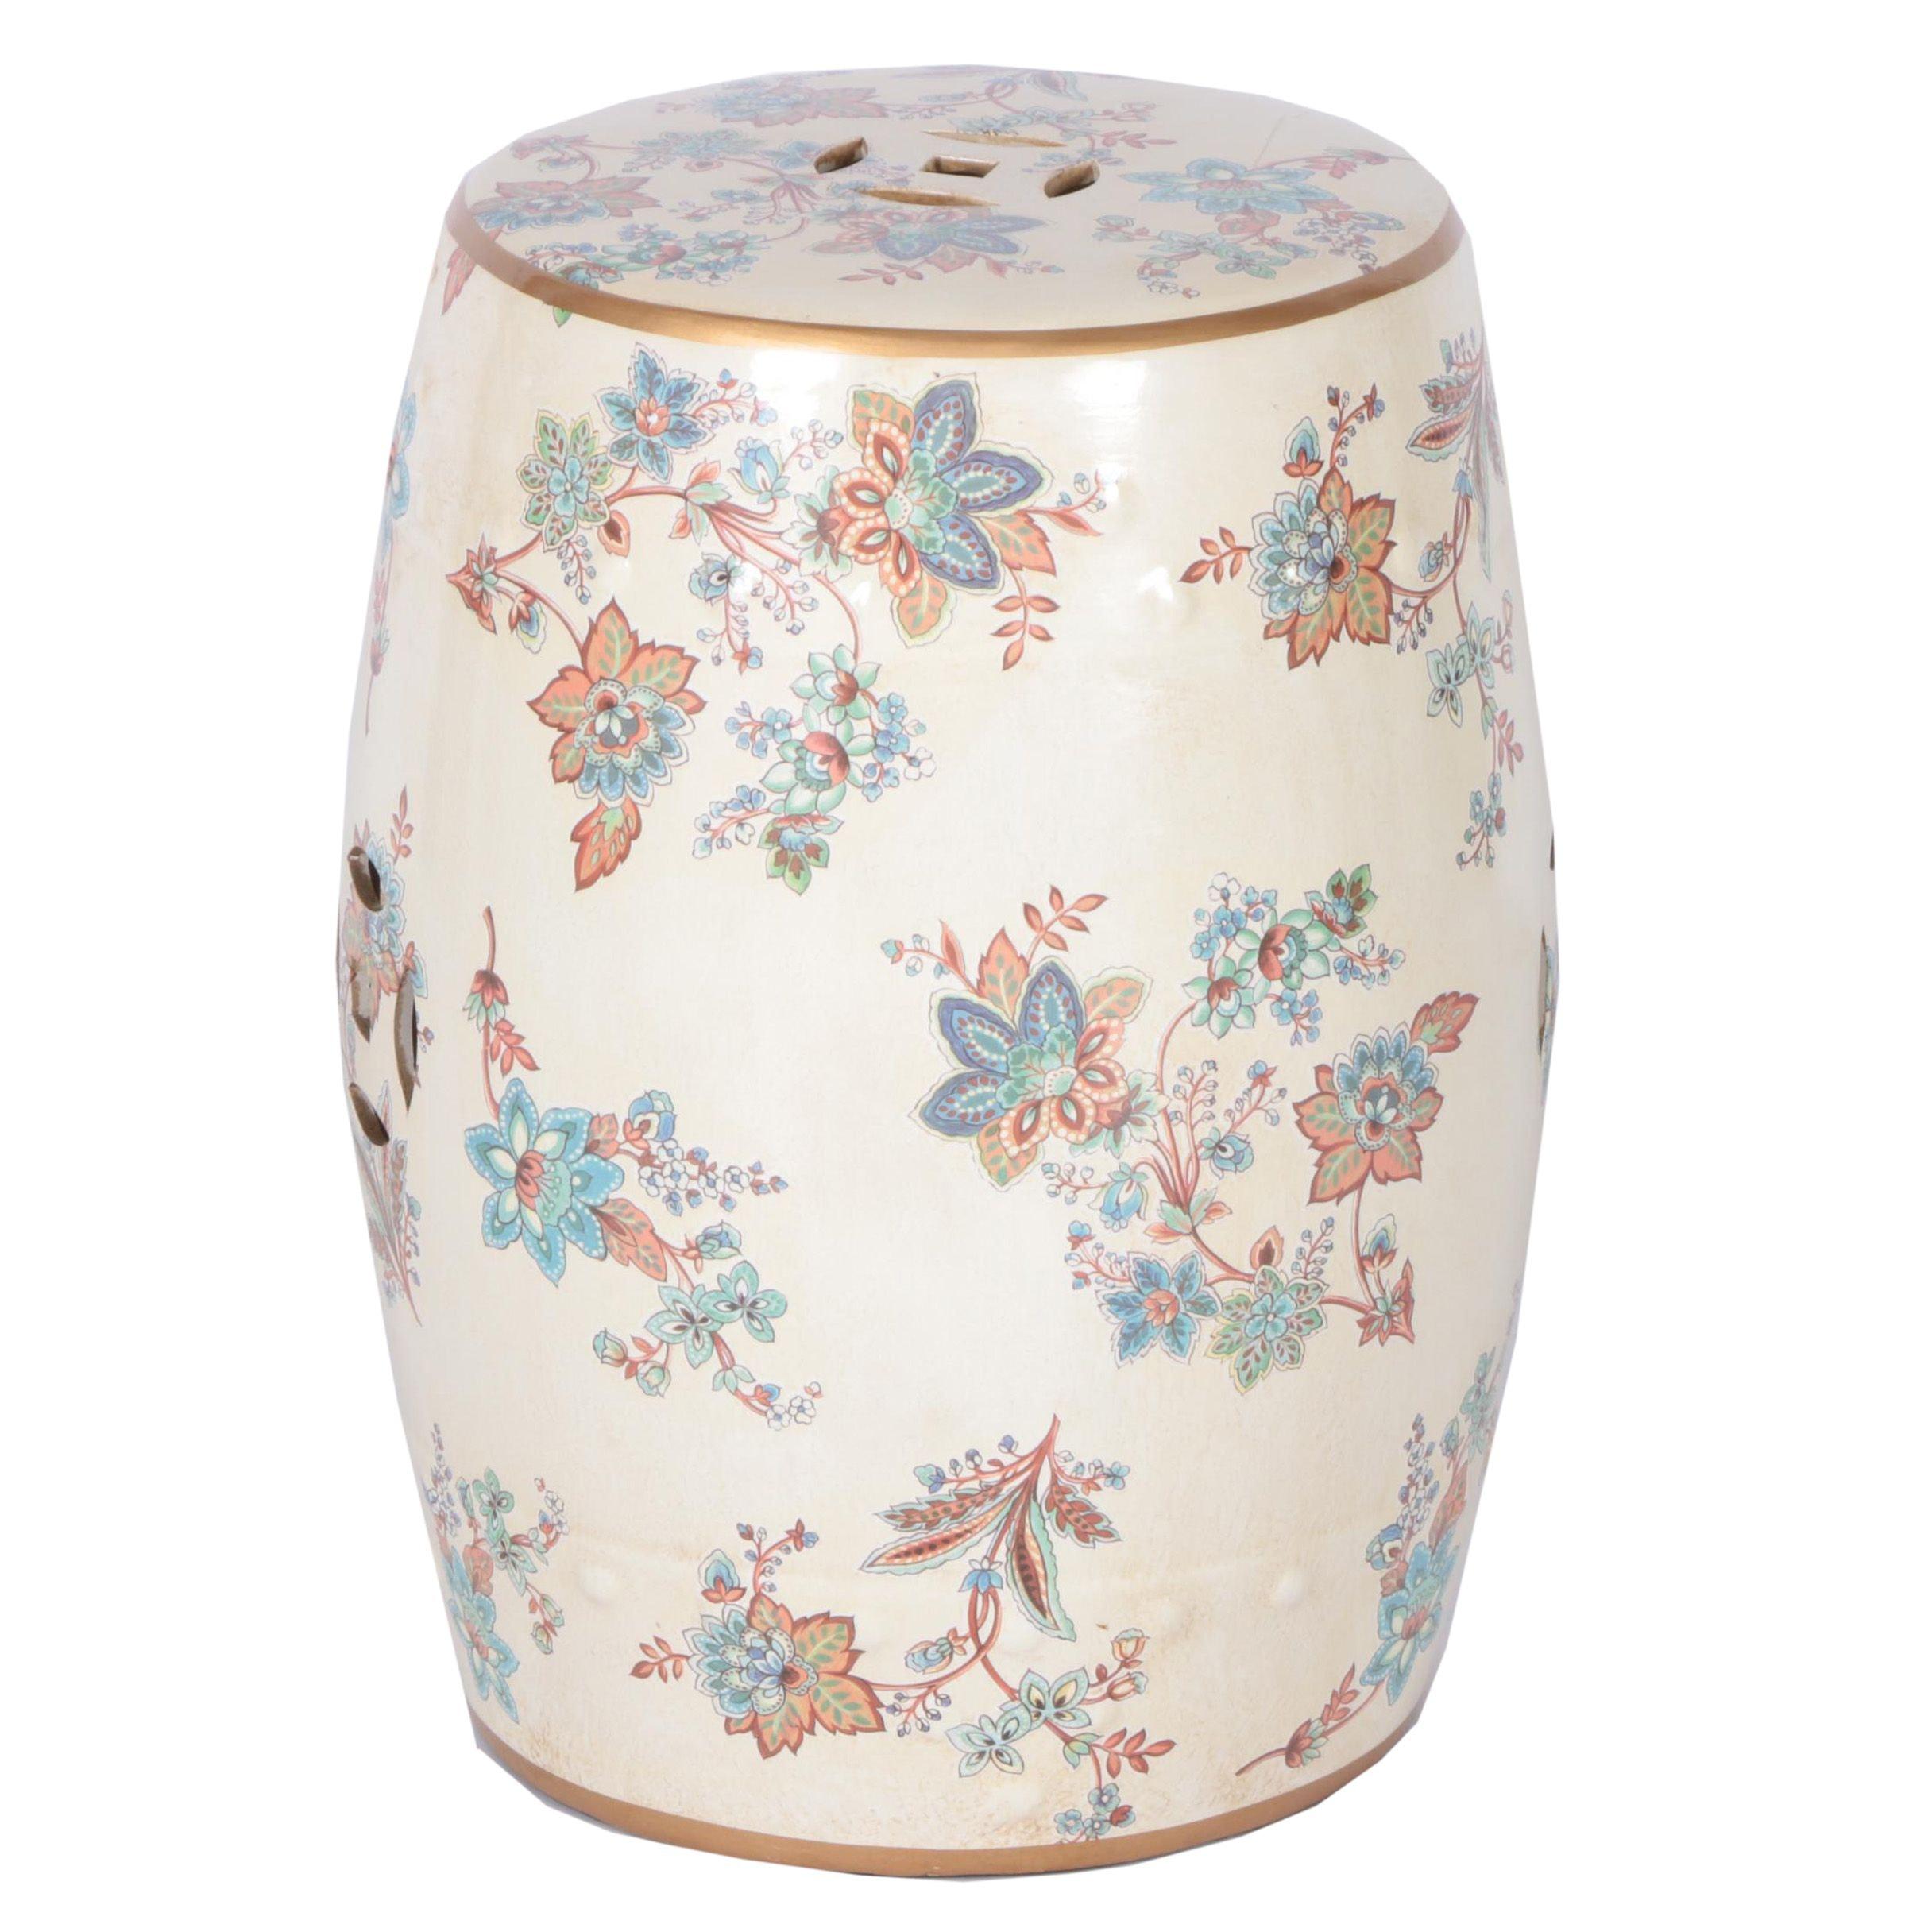 Light Pink Floral Ceramic Garden Stool